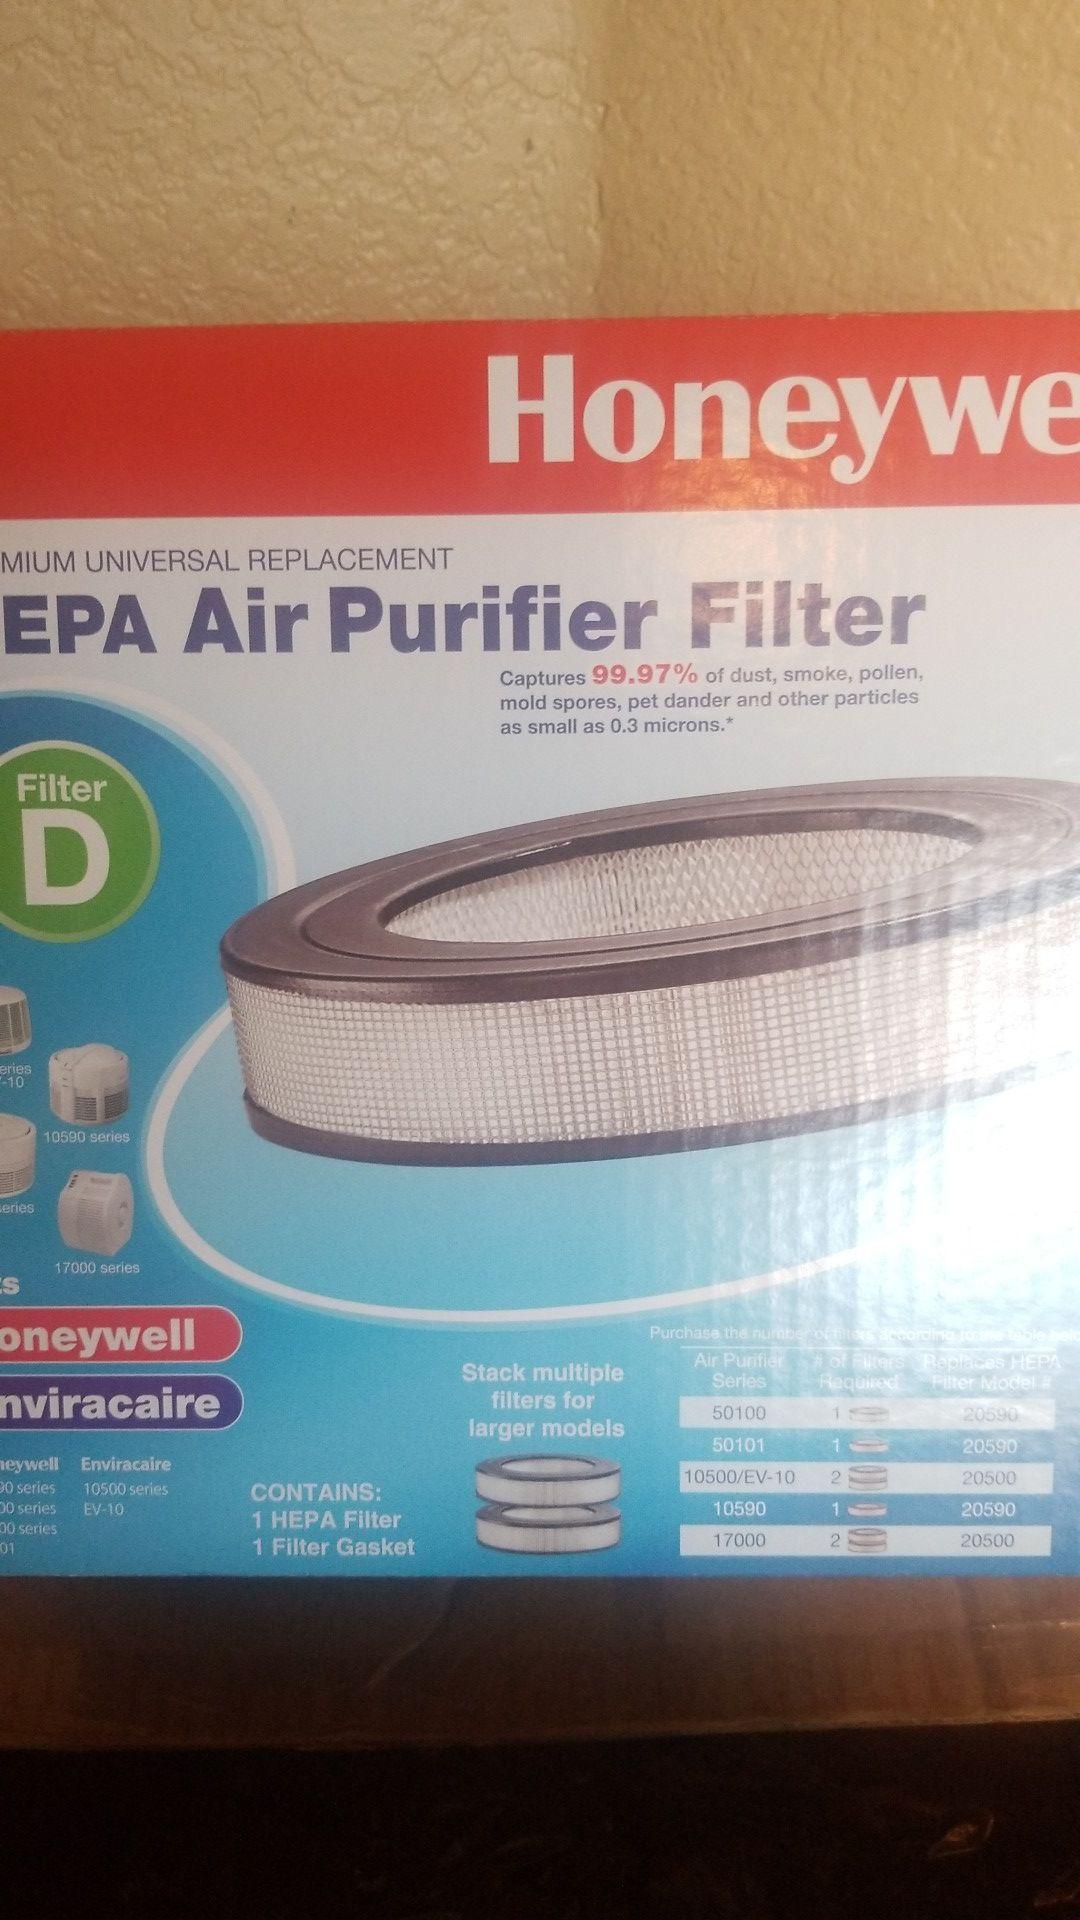 Two Brand new Honeywell HRF-D1 Universal Air Purifier Filters.